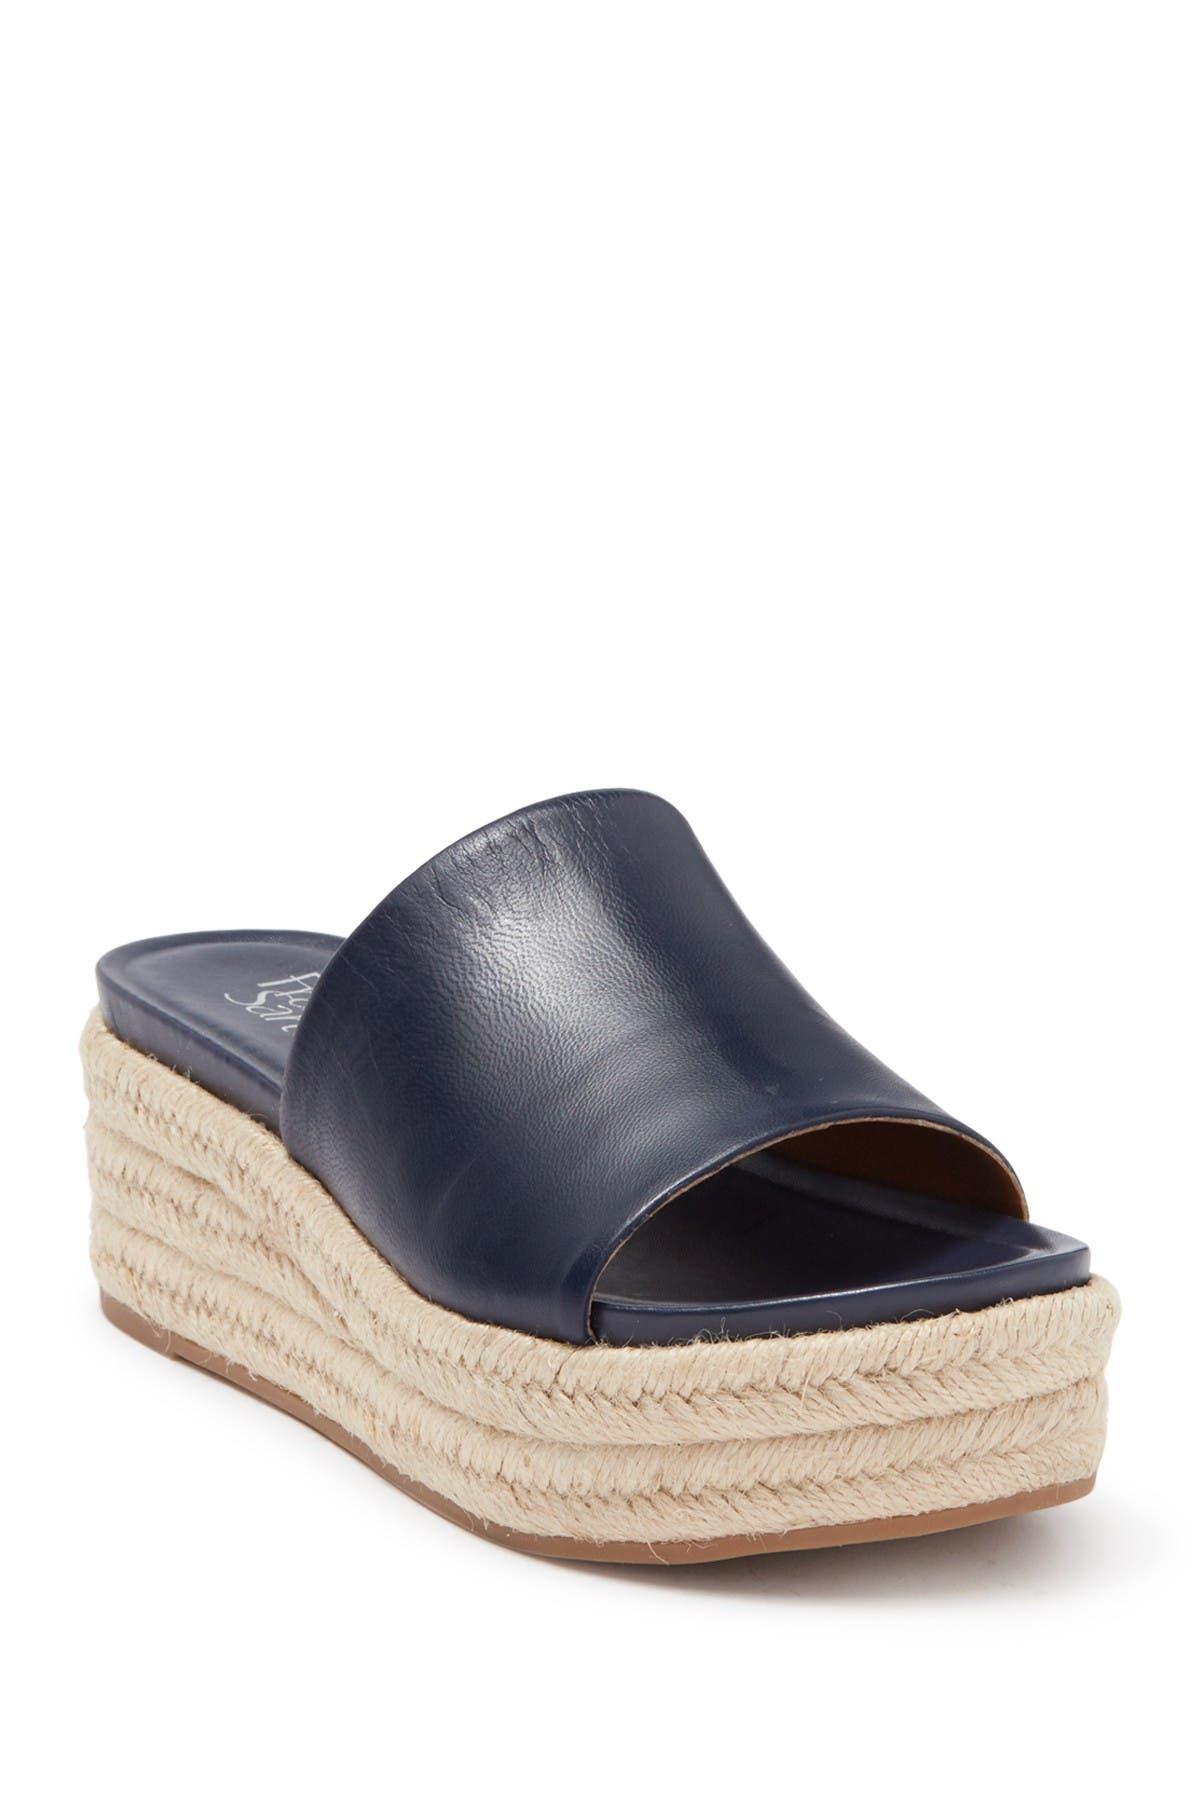 Image of Franco Sarto Tola Espadrille Platform Sandal